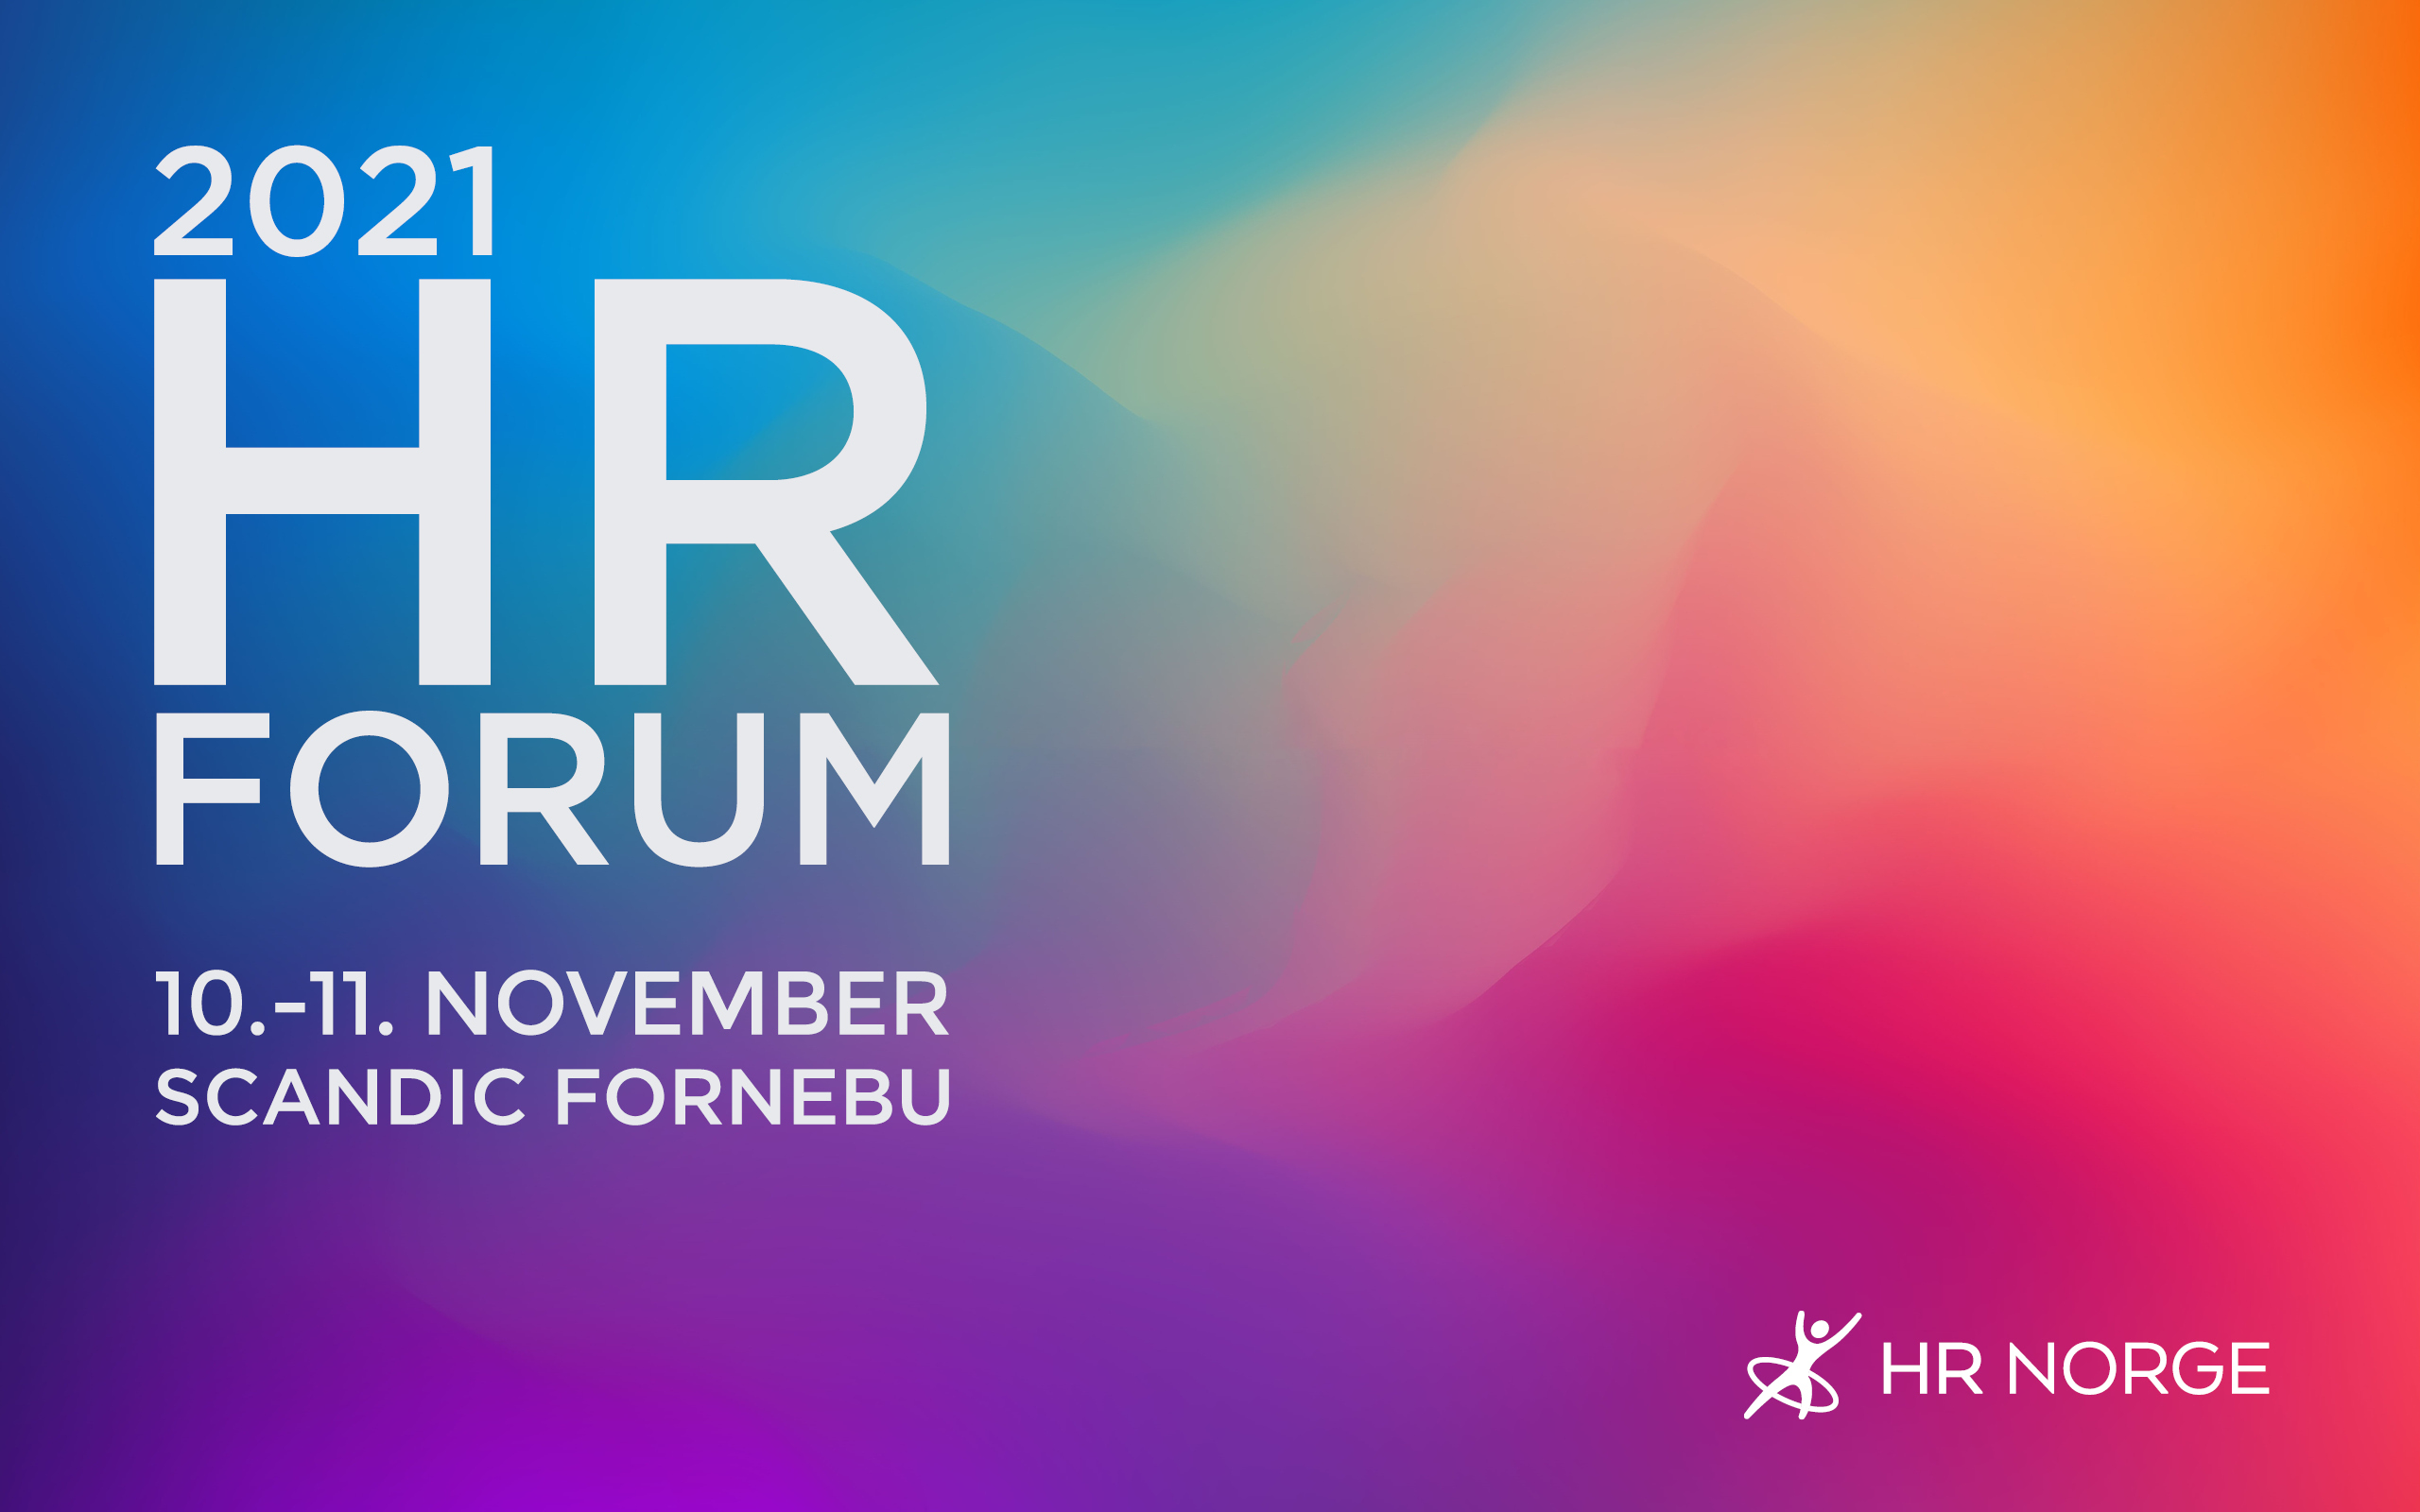 Forside HR Forum 2021